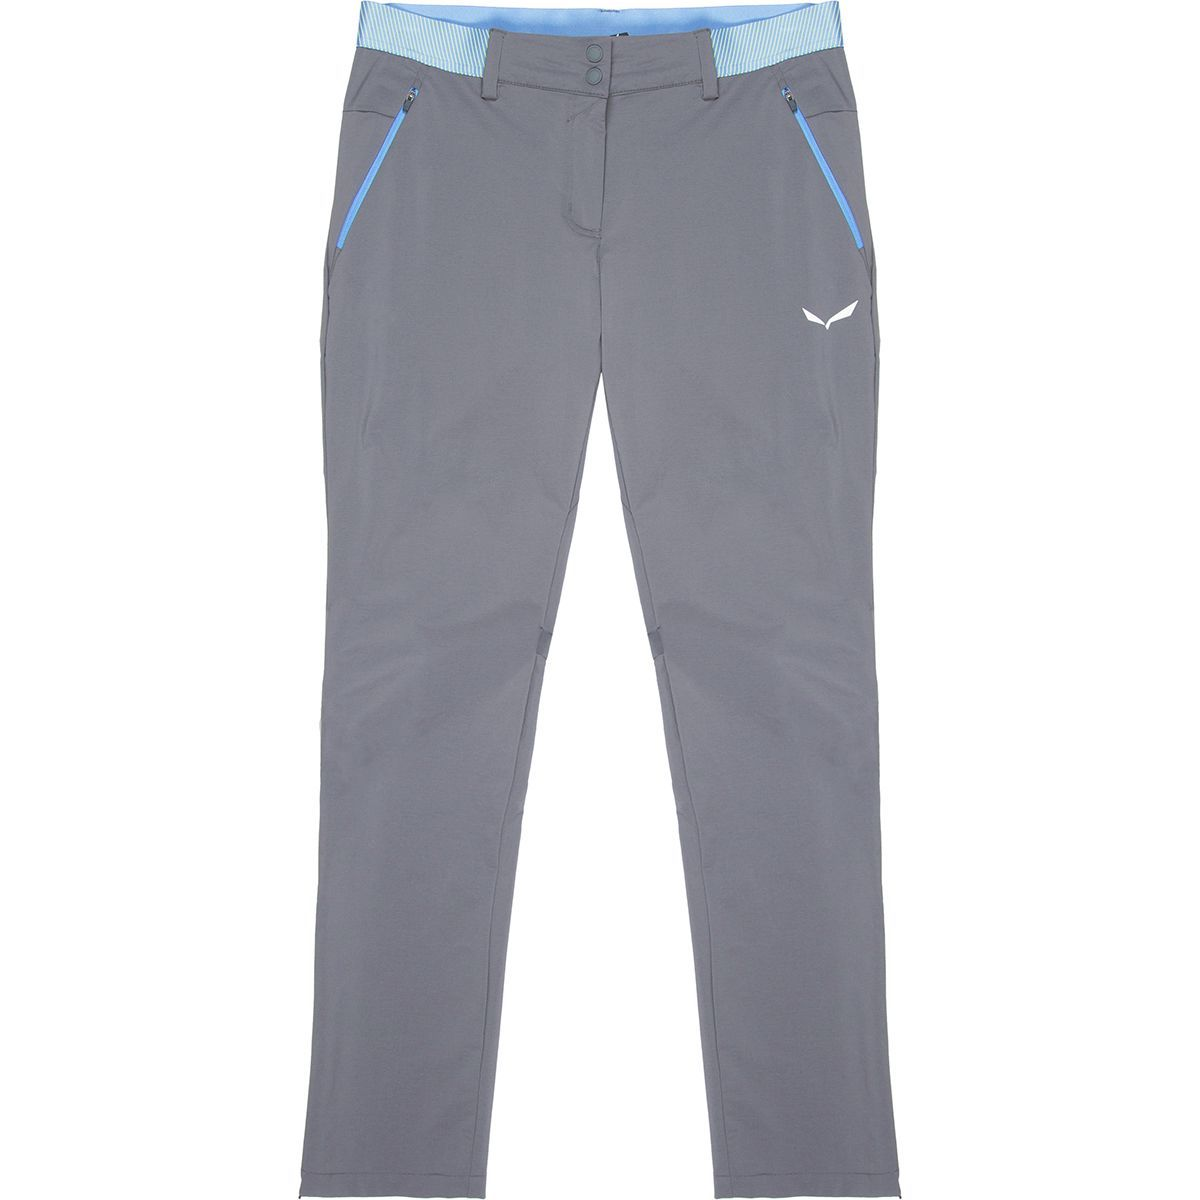 Salewa Pedroc 3 DST Pant - Men's